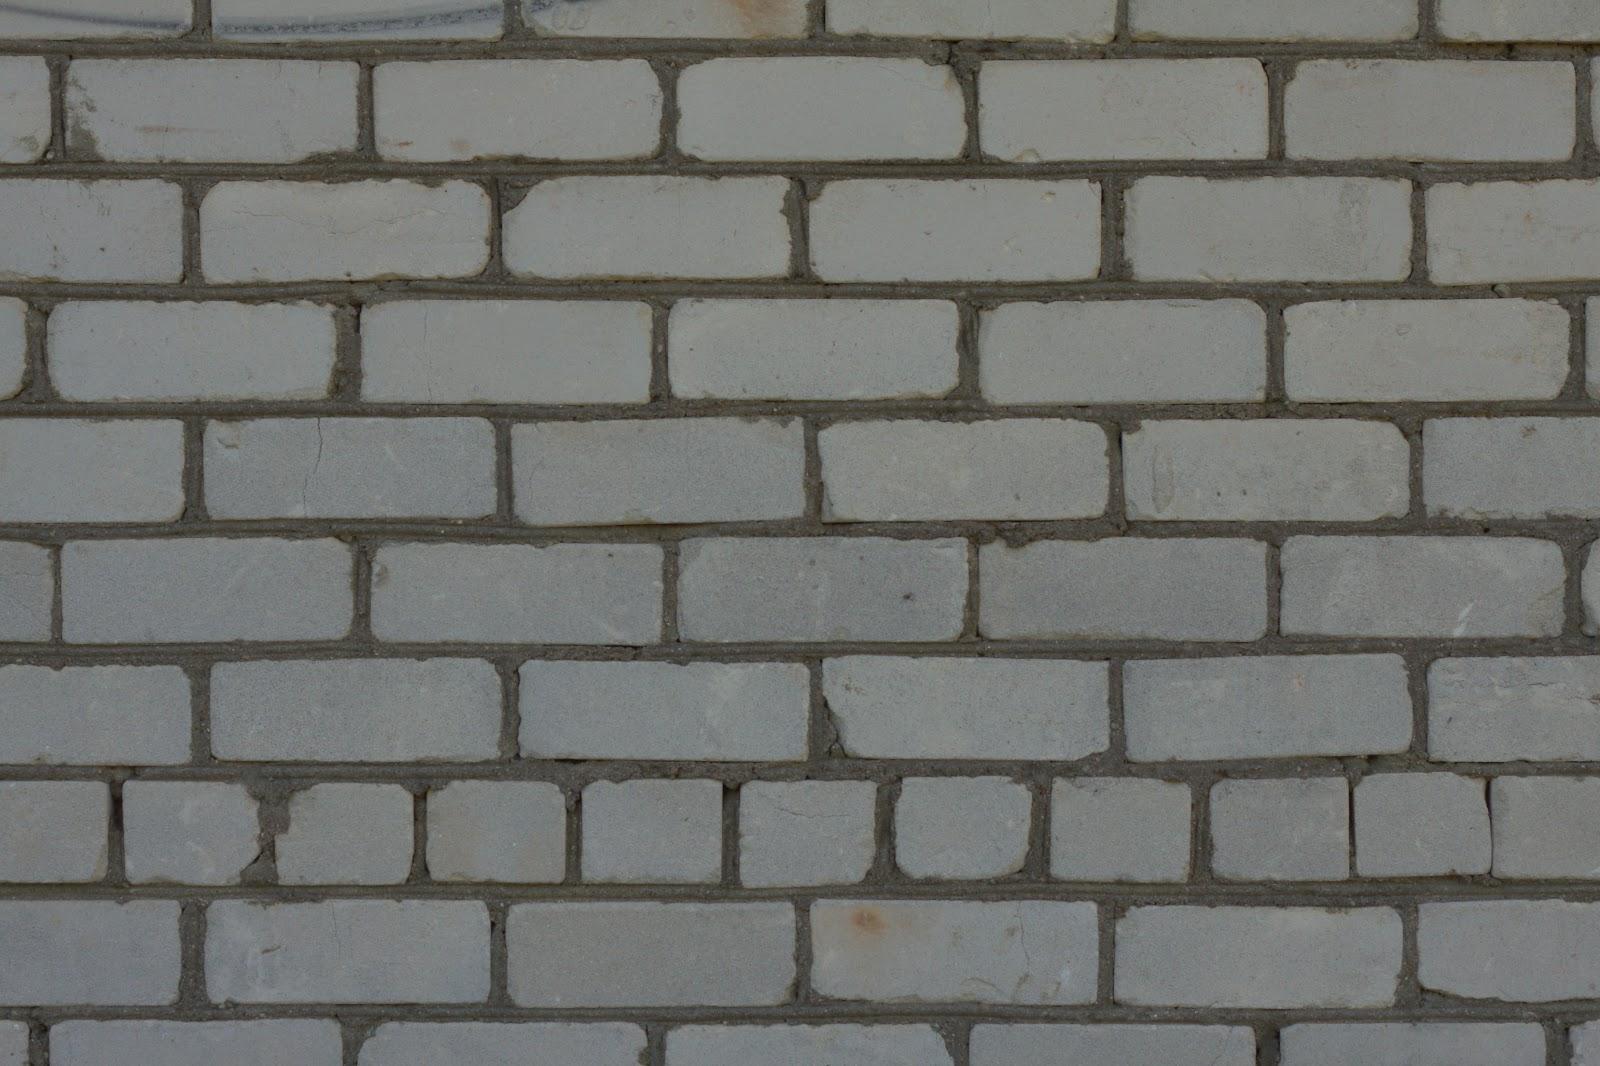 Brick Wall Building Texture Ver 7